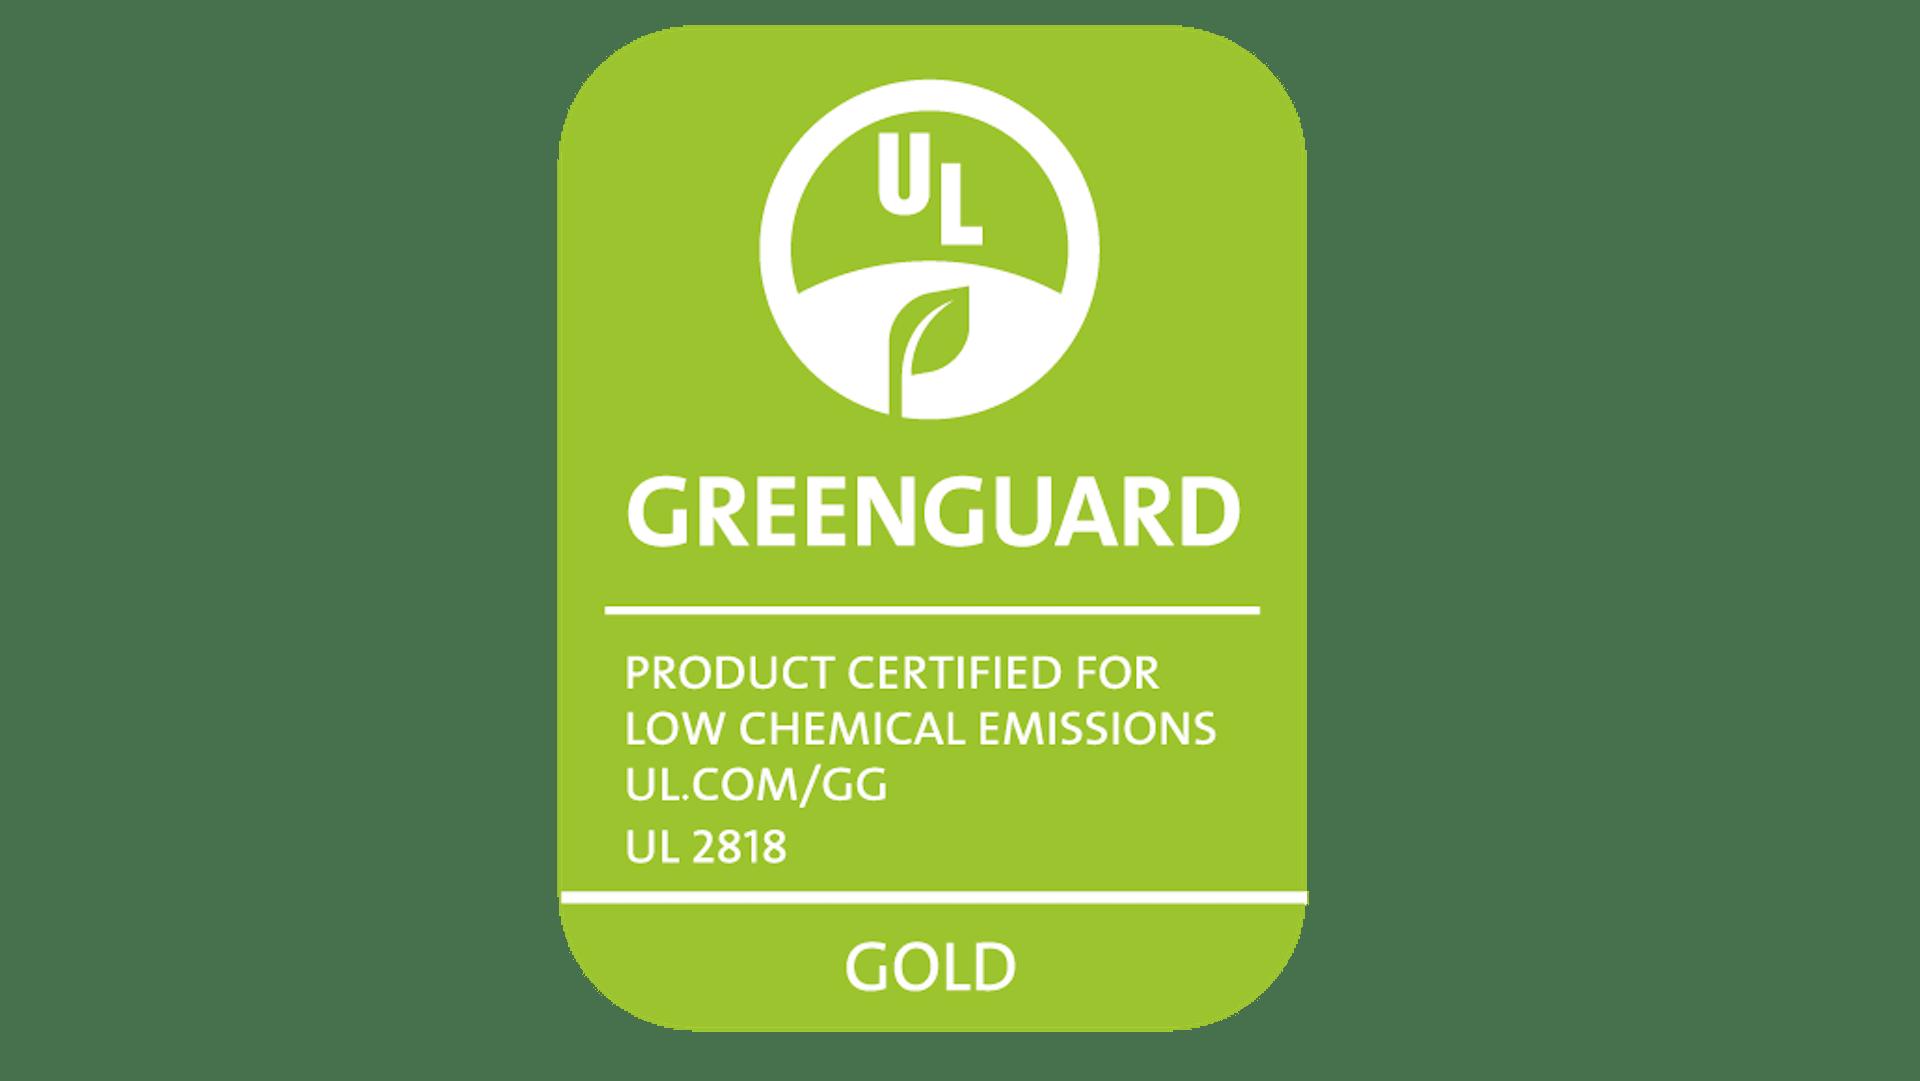 NA, Greenguard, Gold, UL 2818, PNG